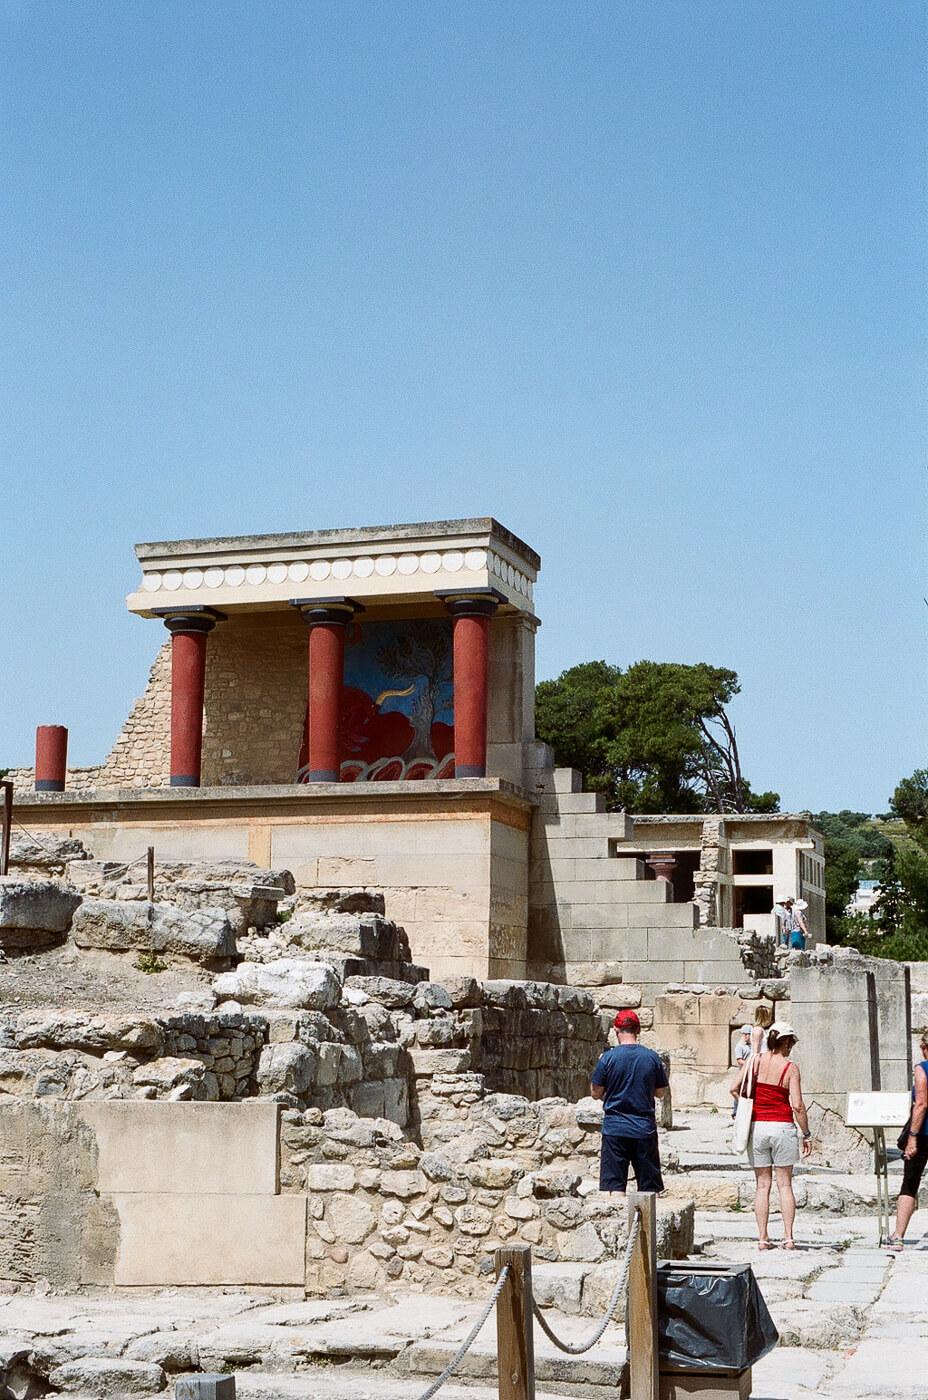 Greece Ruins-3@2x.jpg